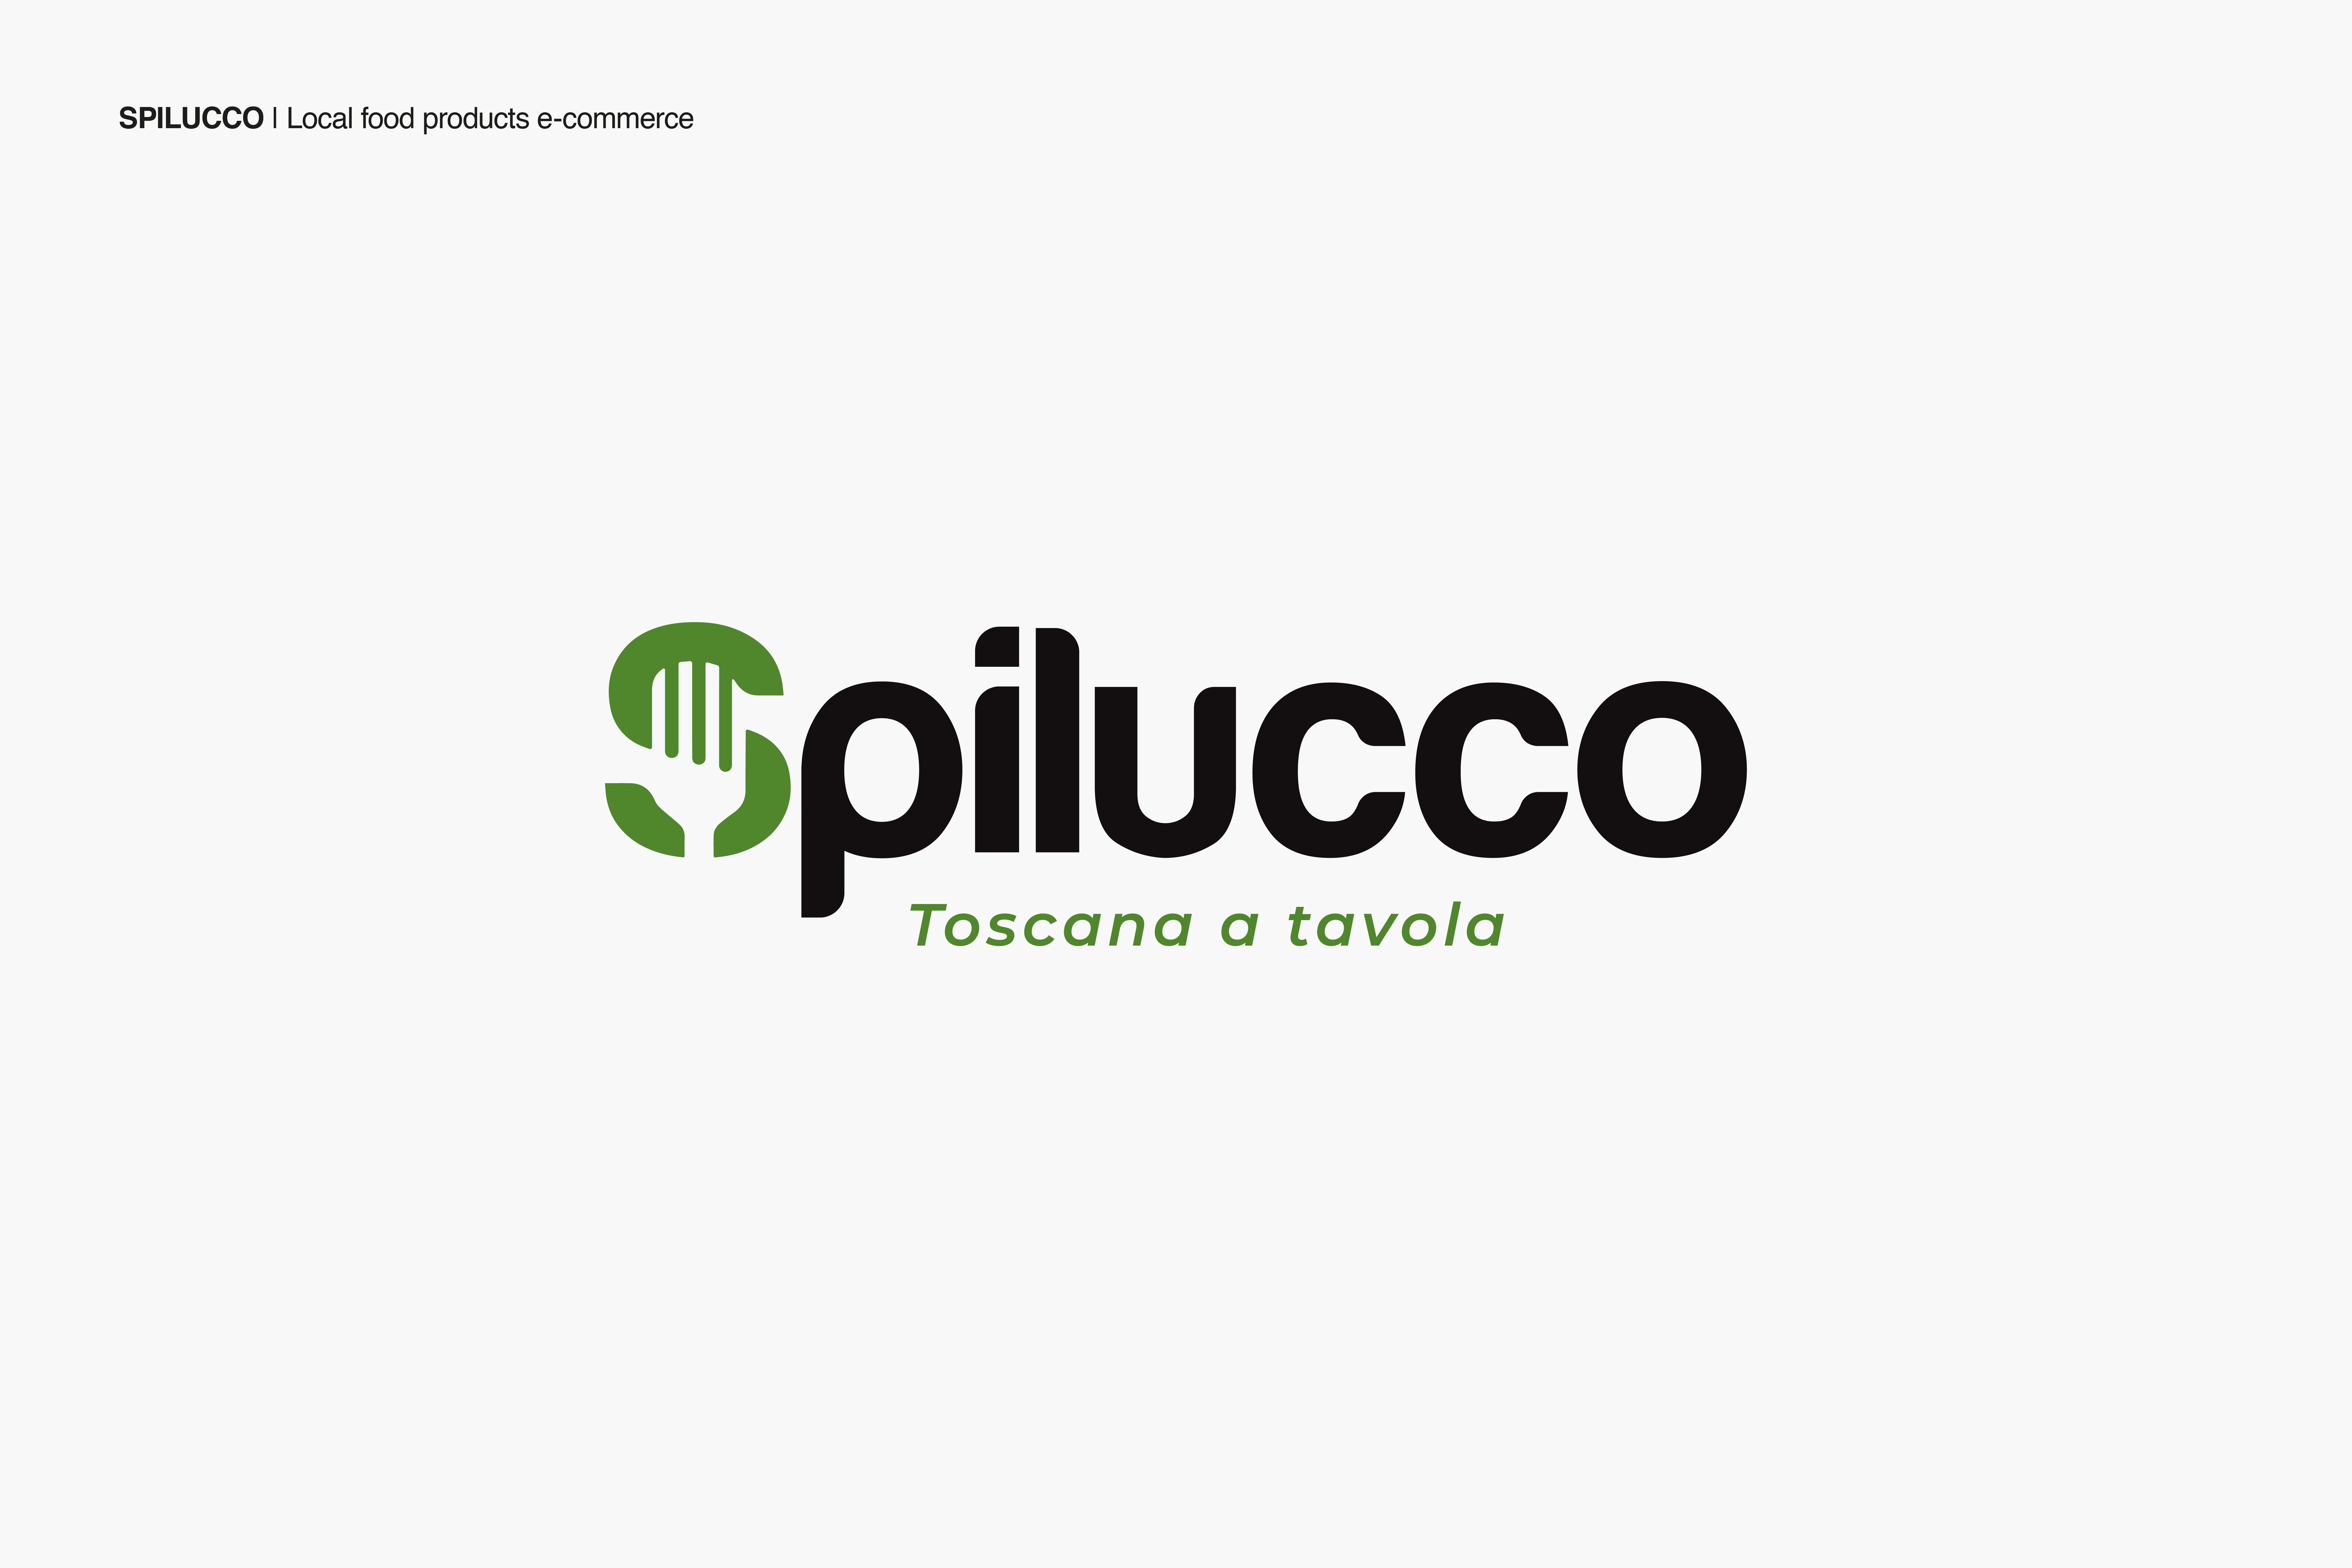 Logo Spilucco by Zerouno Design